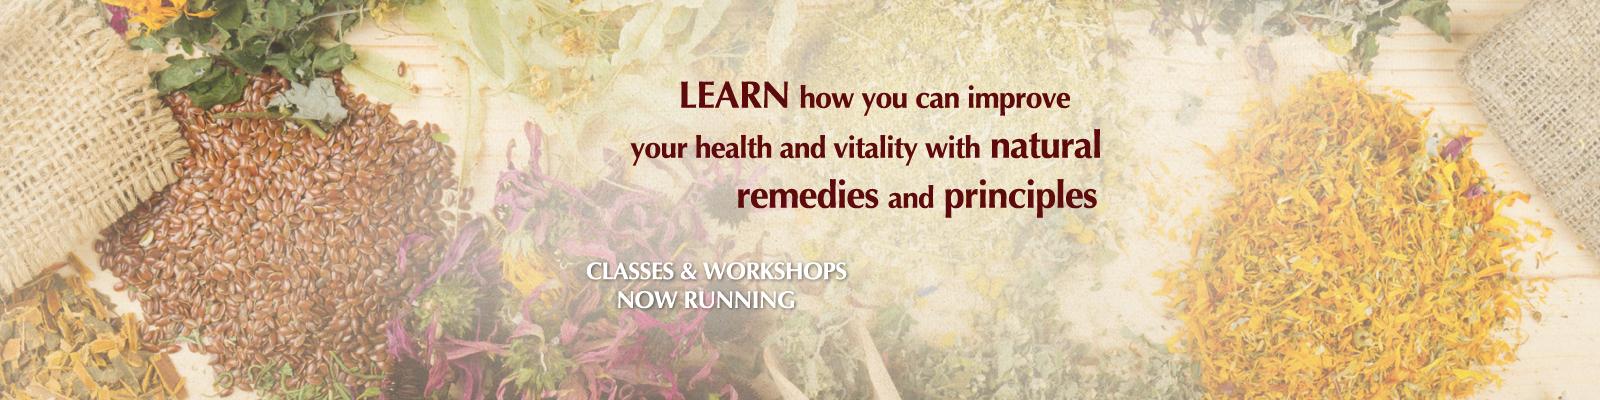 vital-slide-workshops-2